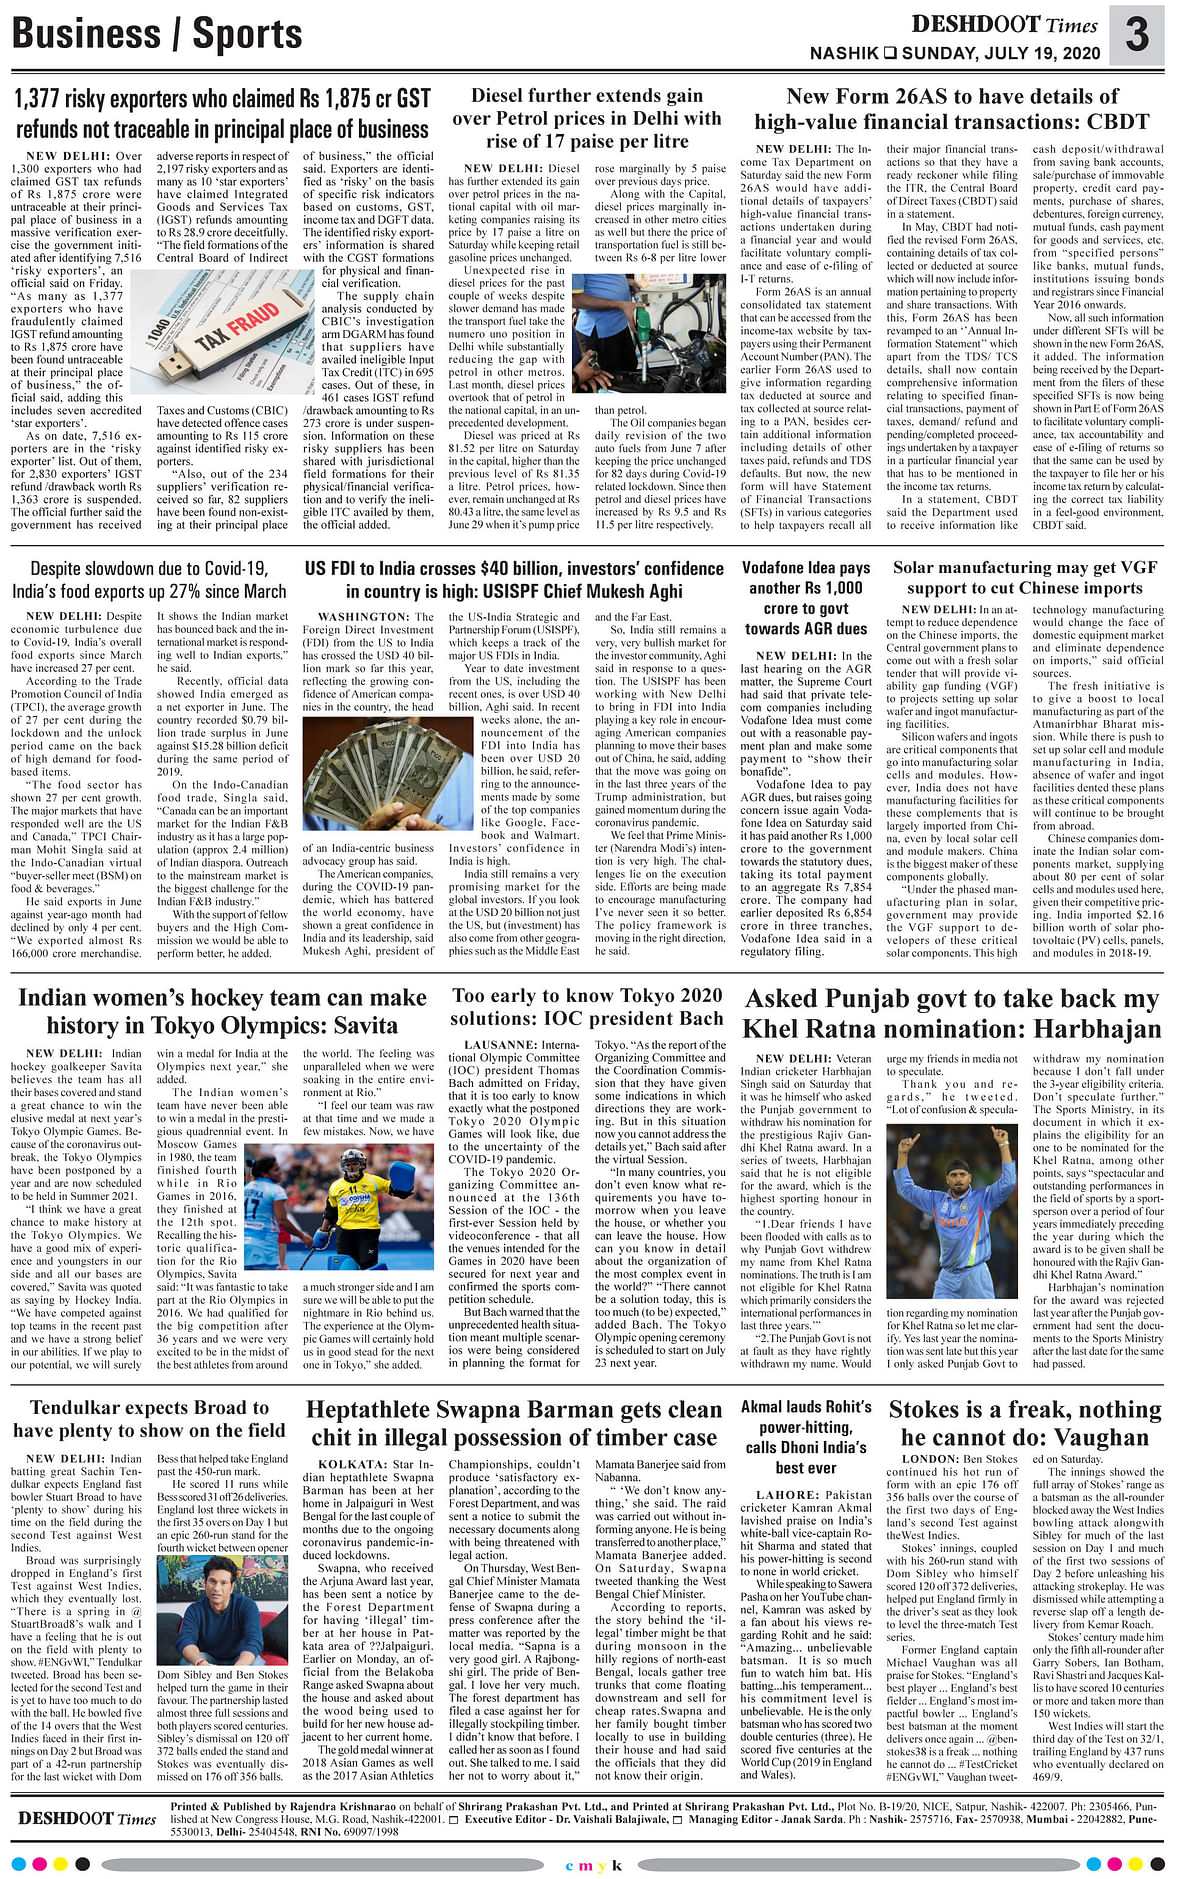 Deshdoot Times E Paper, 19 July 2020